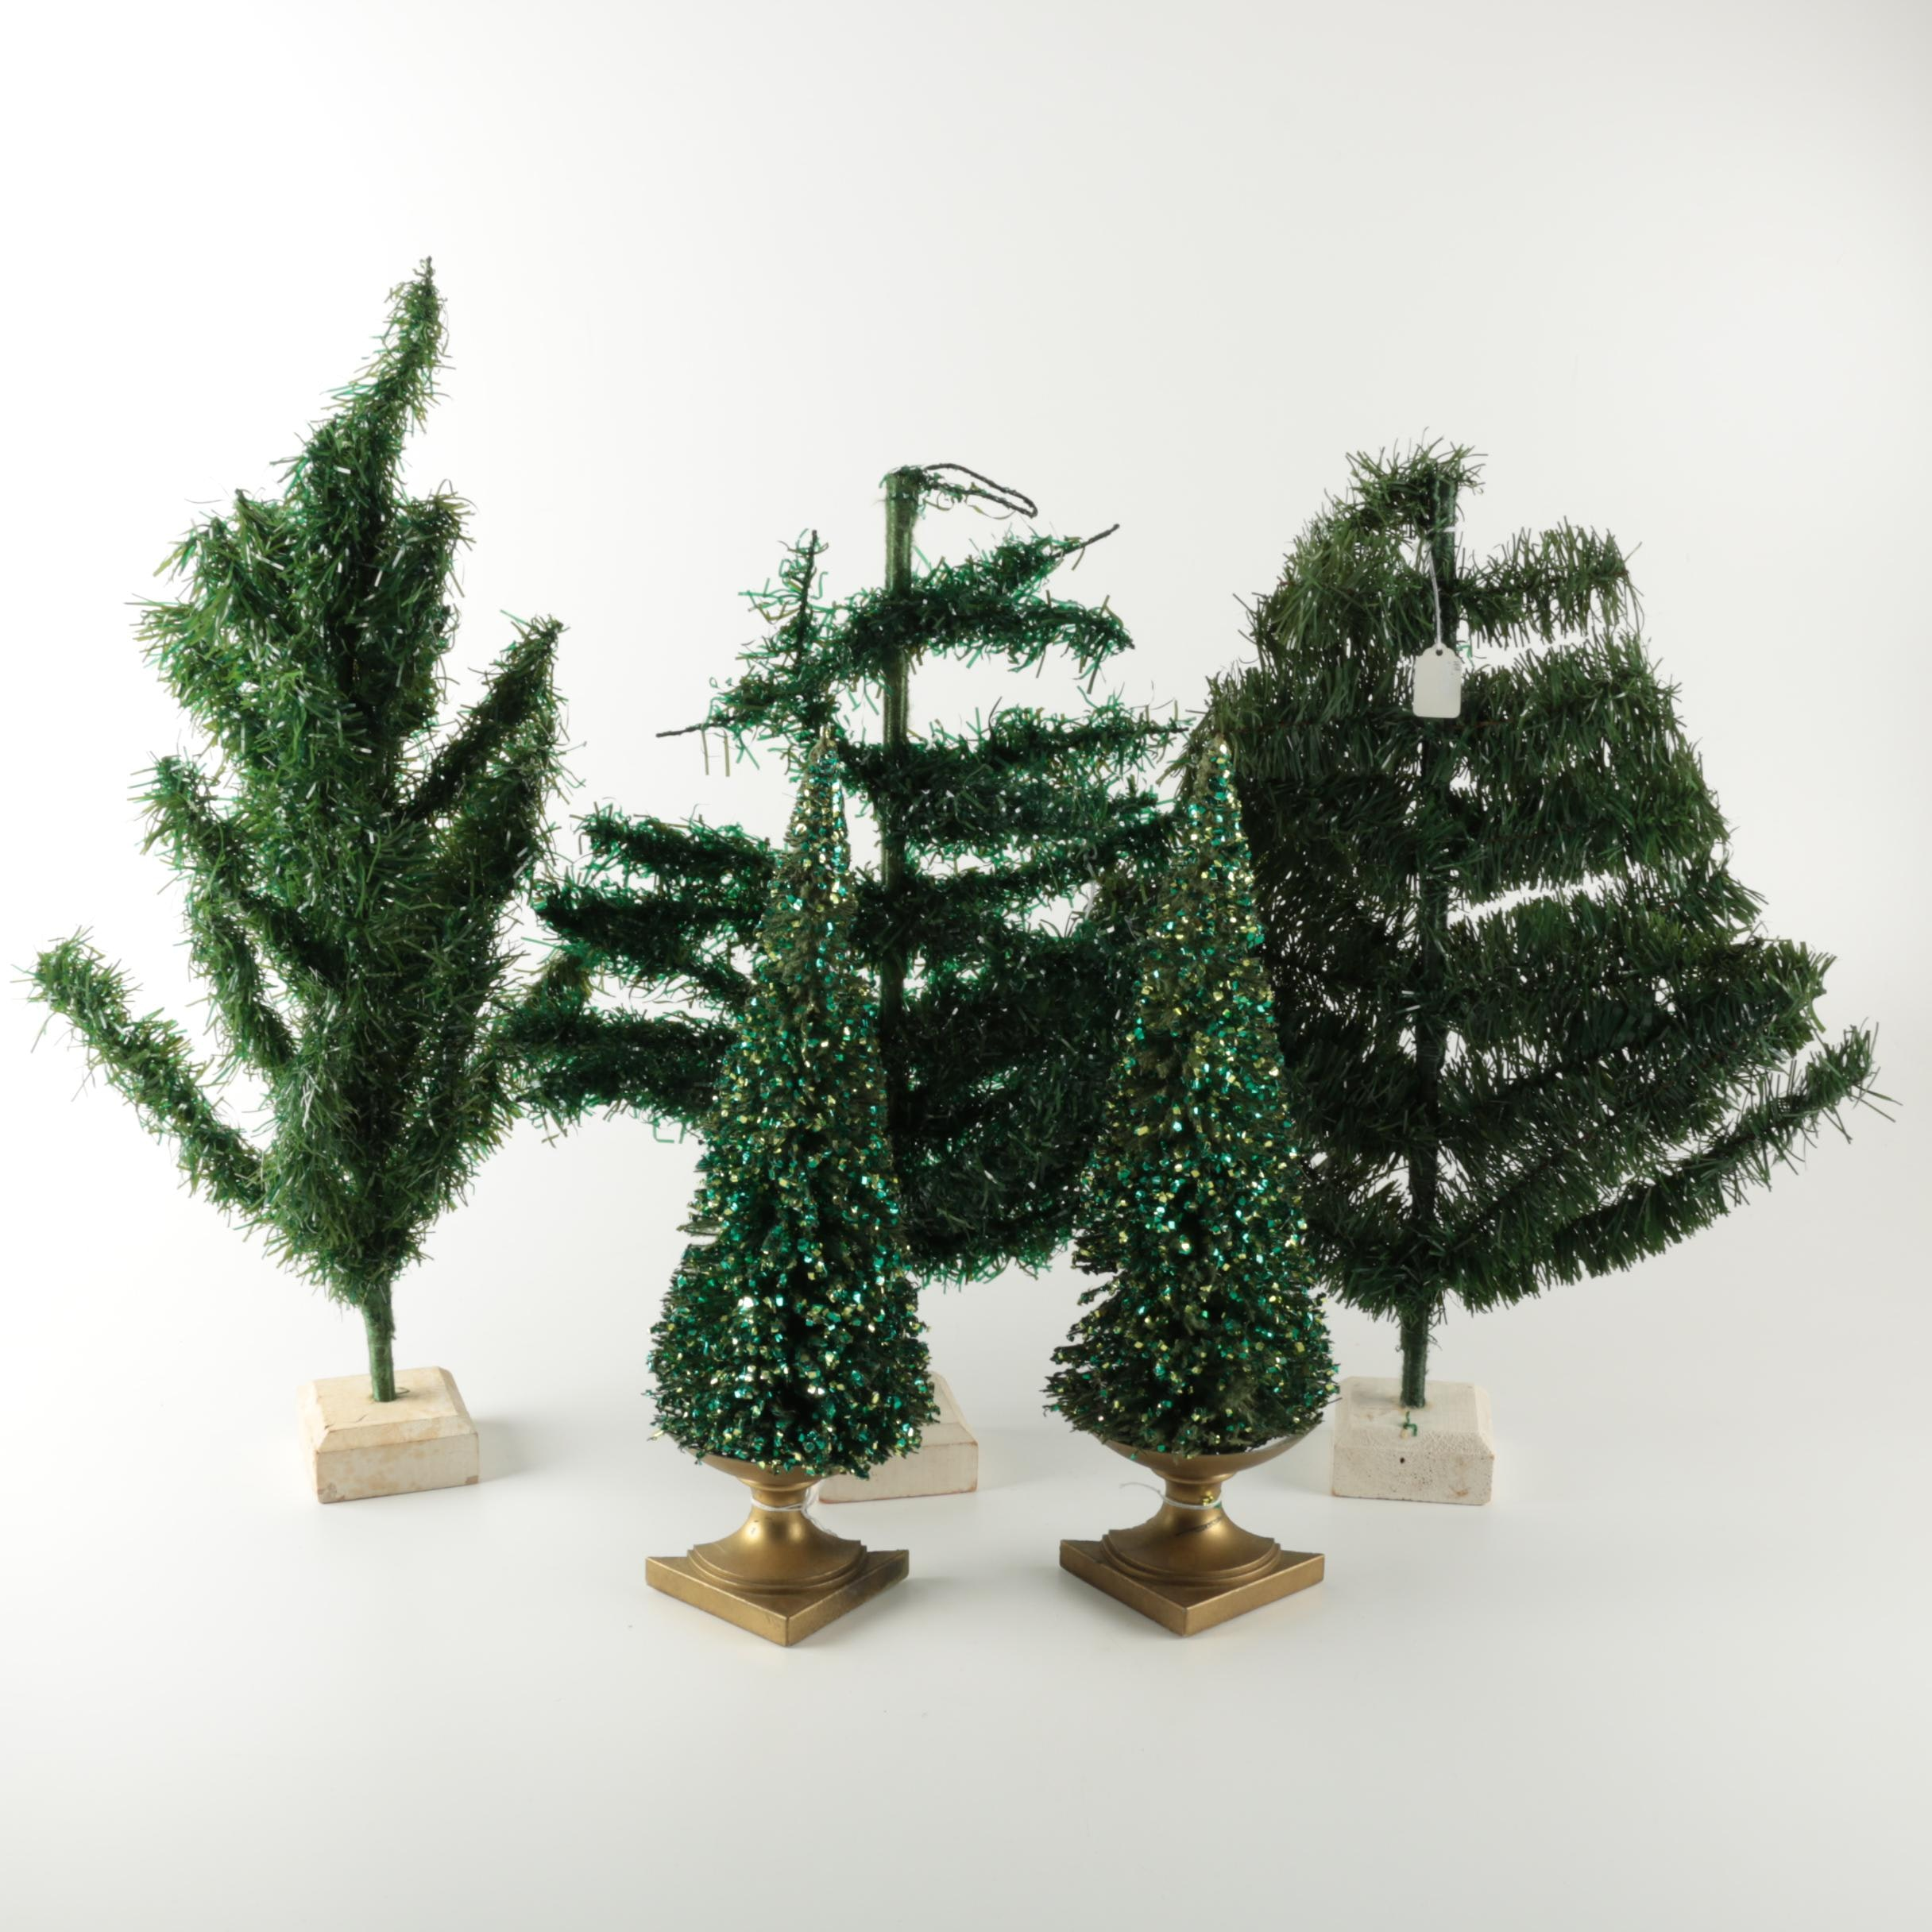 Assortment of Tabletop Plastic Christmas Trees